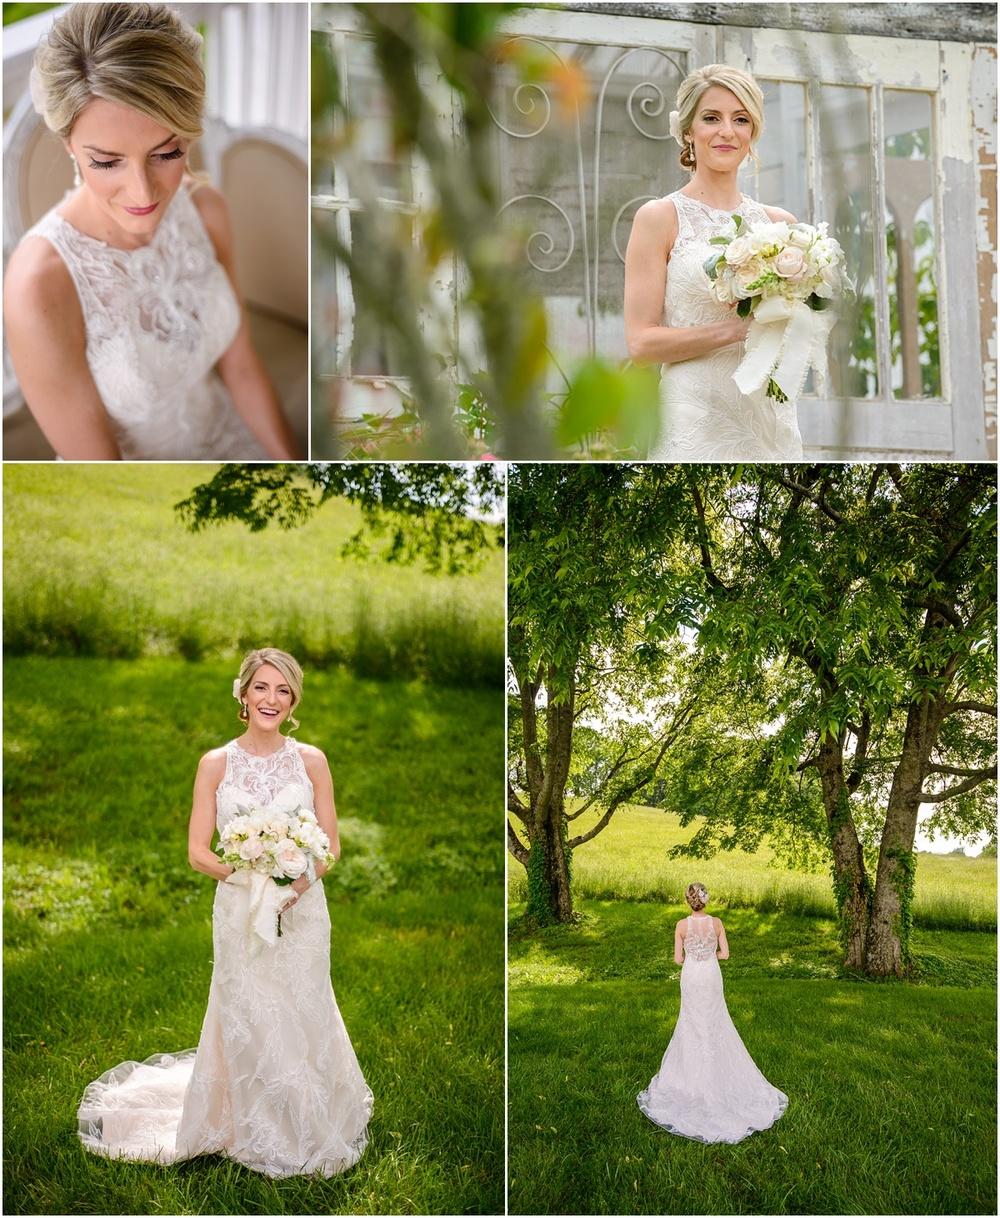 Greg Smit Photography Mint Springs Farm Nashville Tennessee wedding photographer_0385